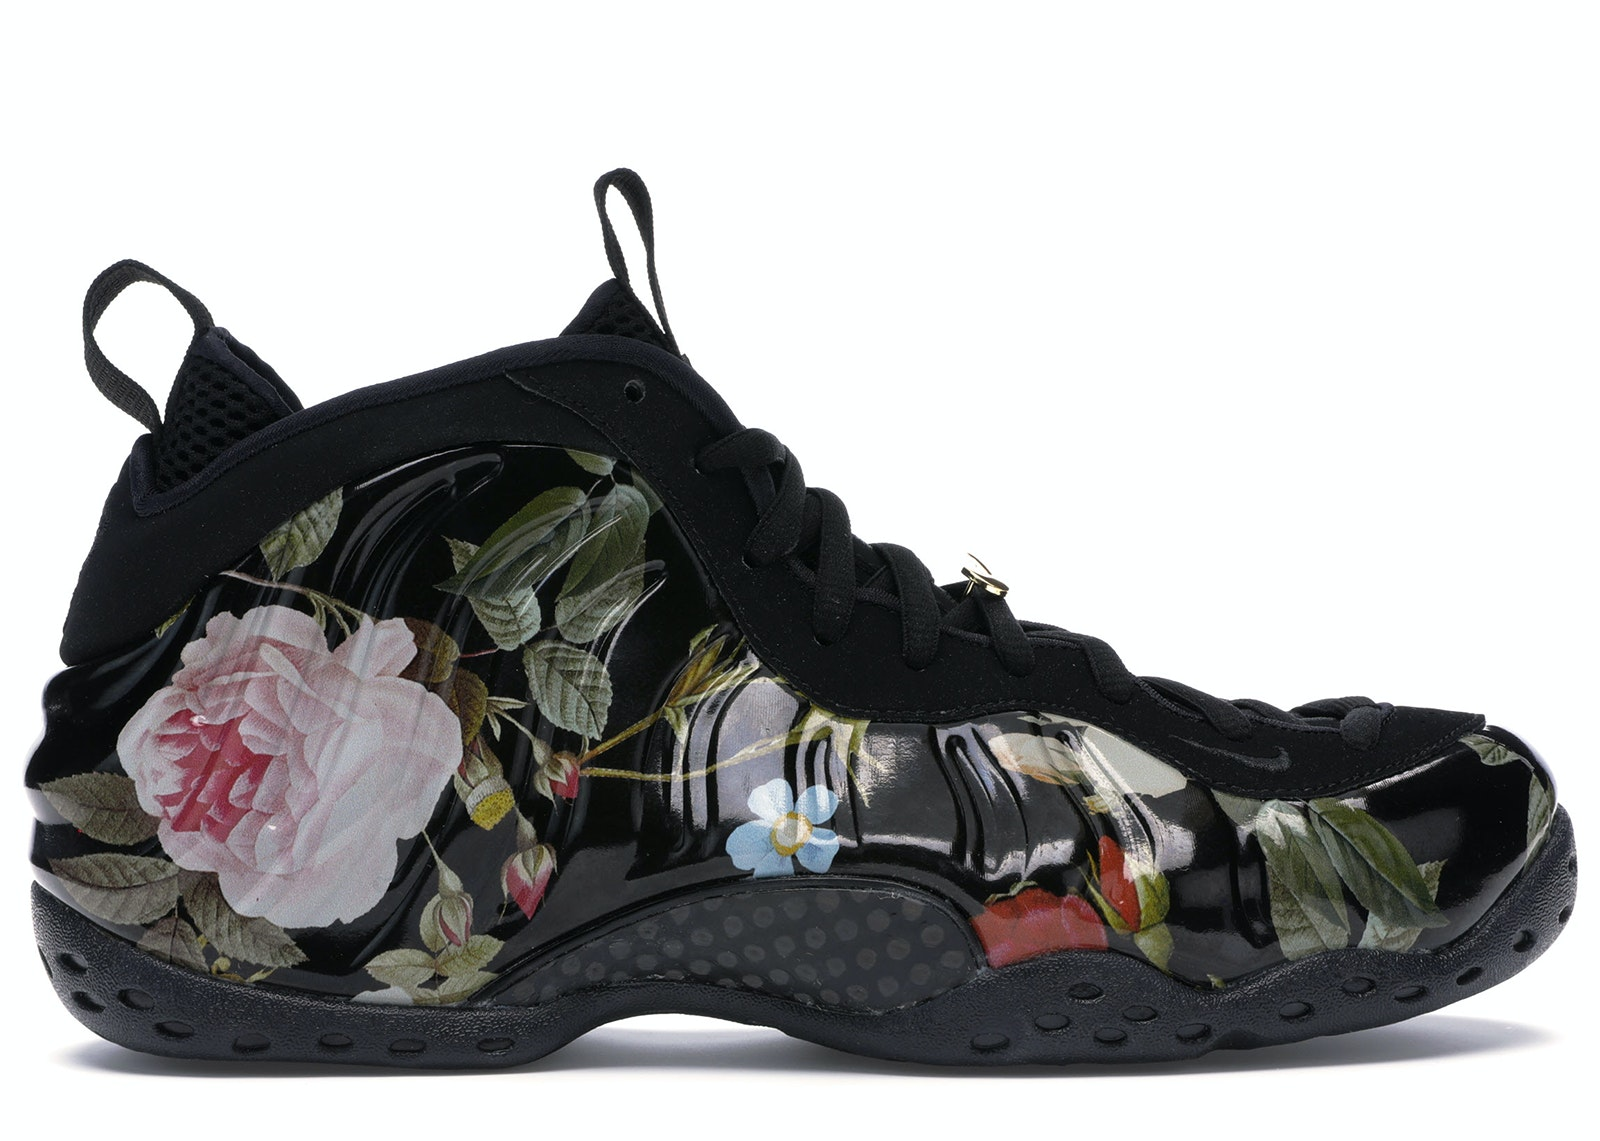 Nike Air Foamposite One Albino Snakeskin Black 314996101 ...